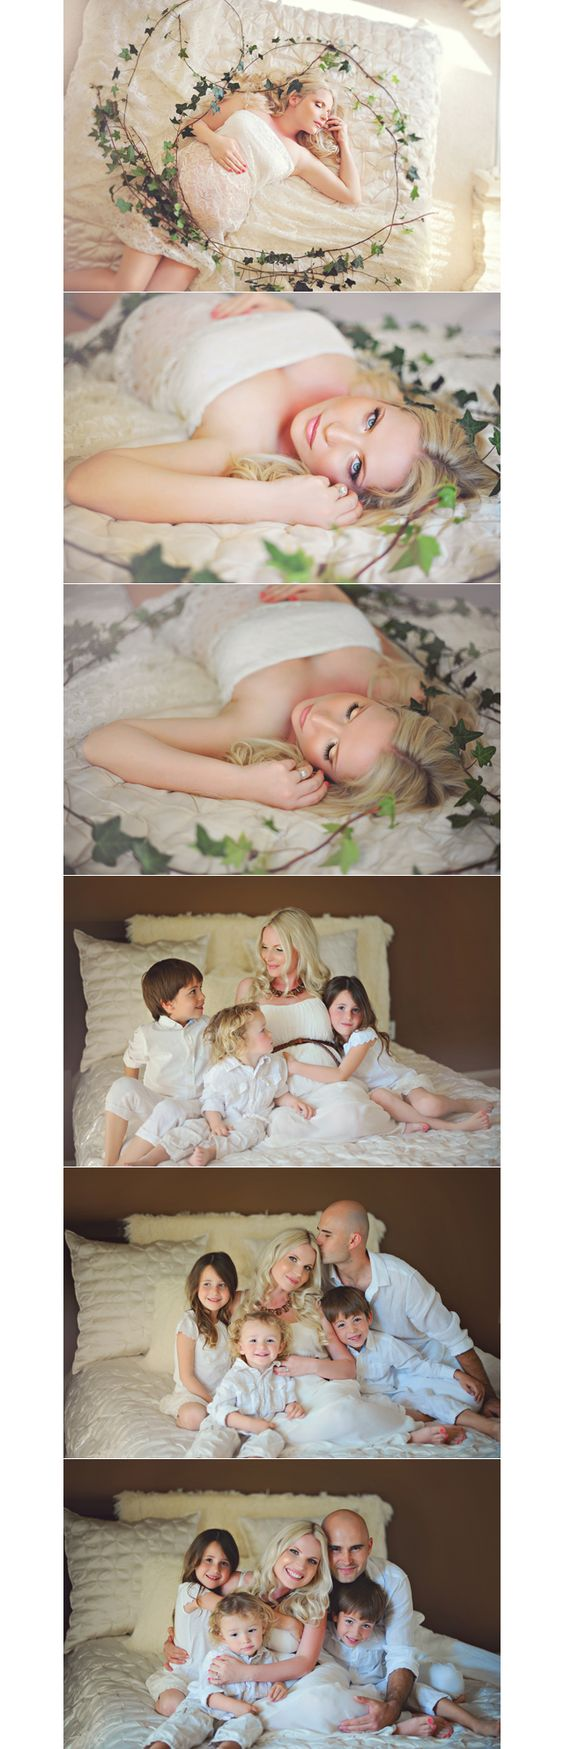 ArinaB Photography|Maternity Photography Inspiration « Evoking You|Inspiration for your photography